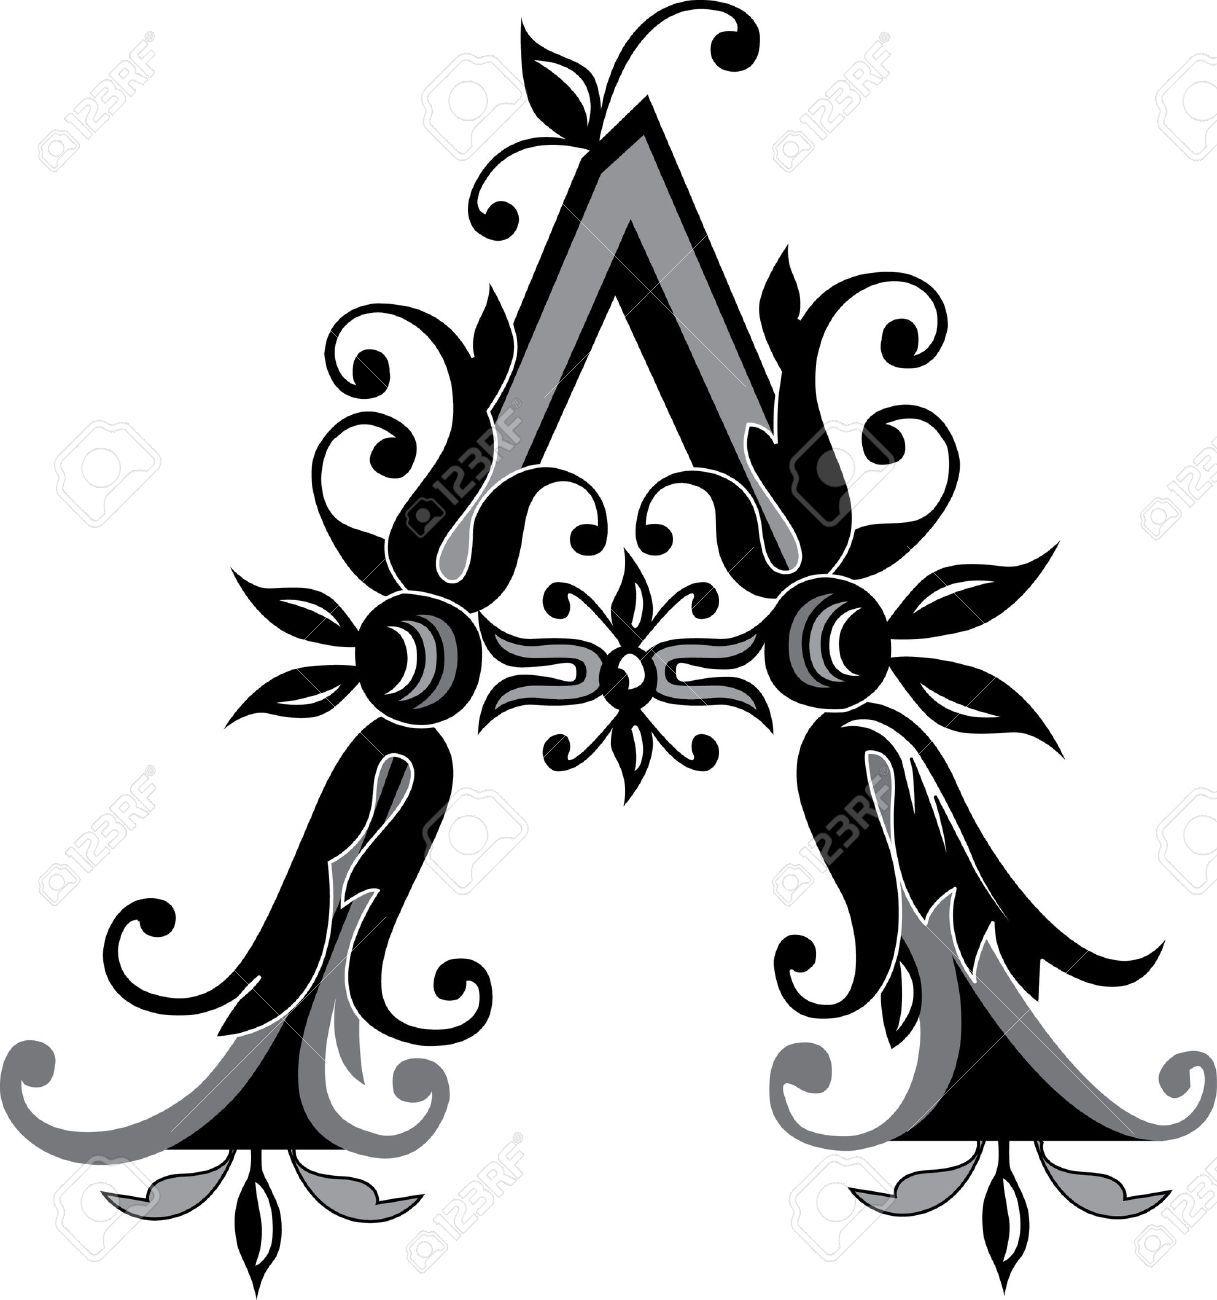 Foliage English Alphabet Letter A Black And White